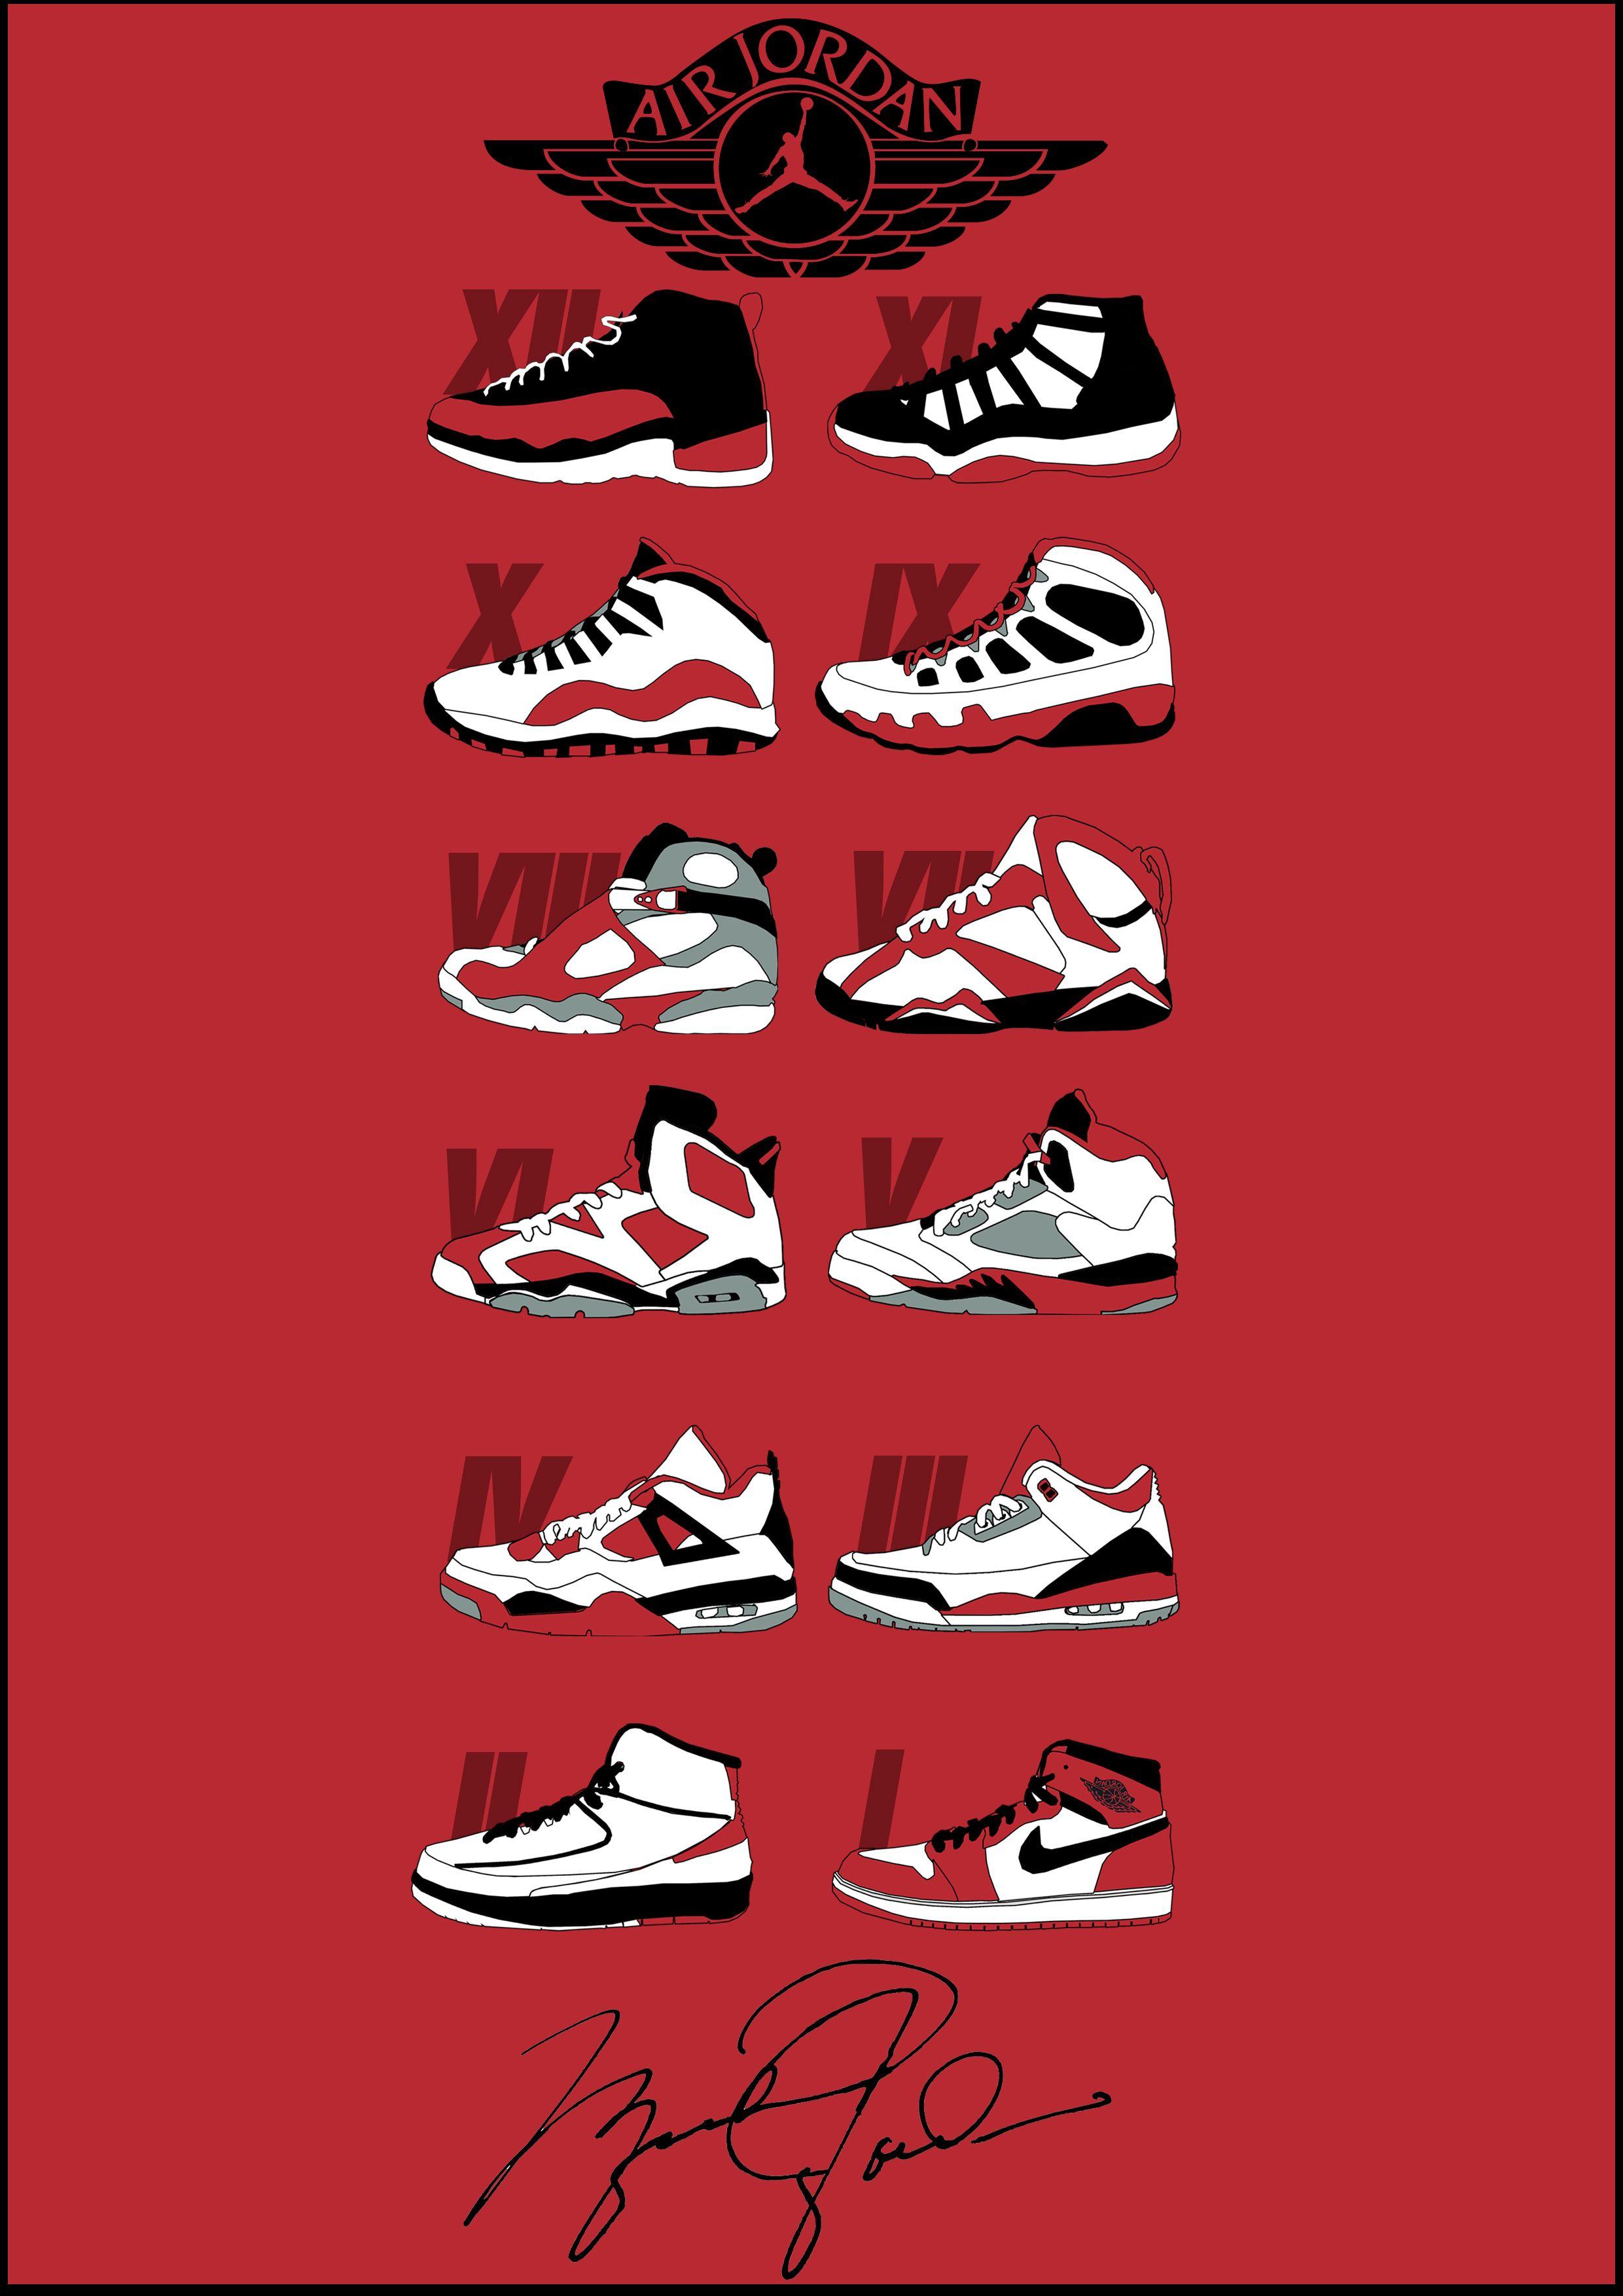 Air Jordan 12 Poster Jordan Shoe Jordan Fondos De Pantalla Nike Fondo De Pantalla De Supreme Fondos De Nike